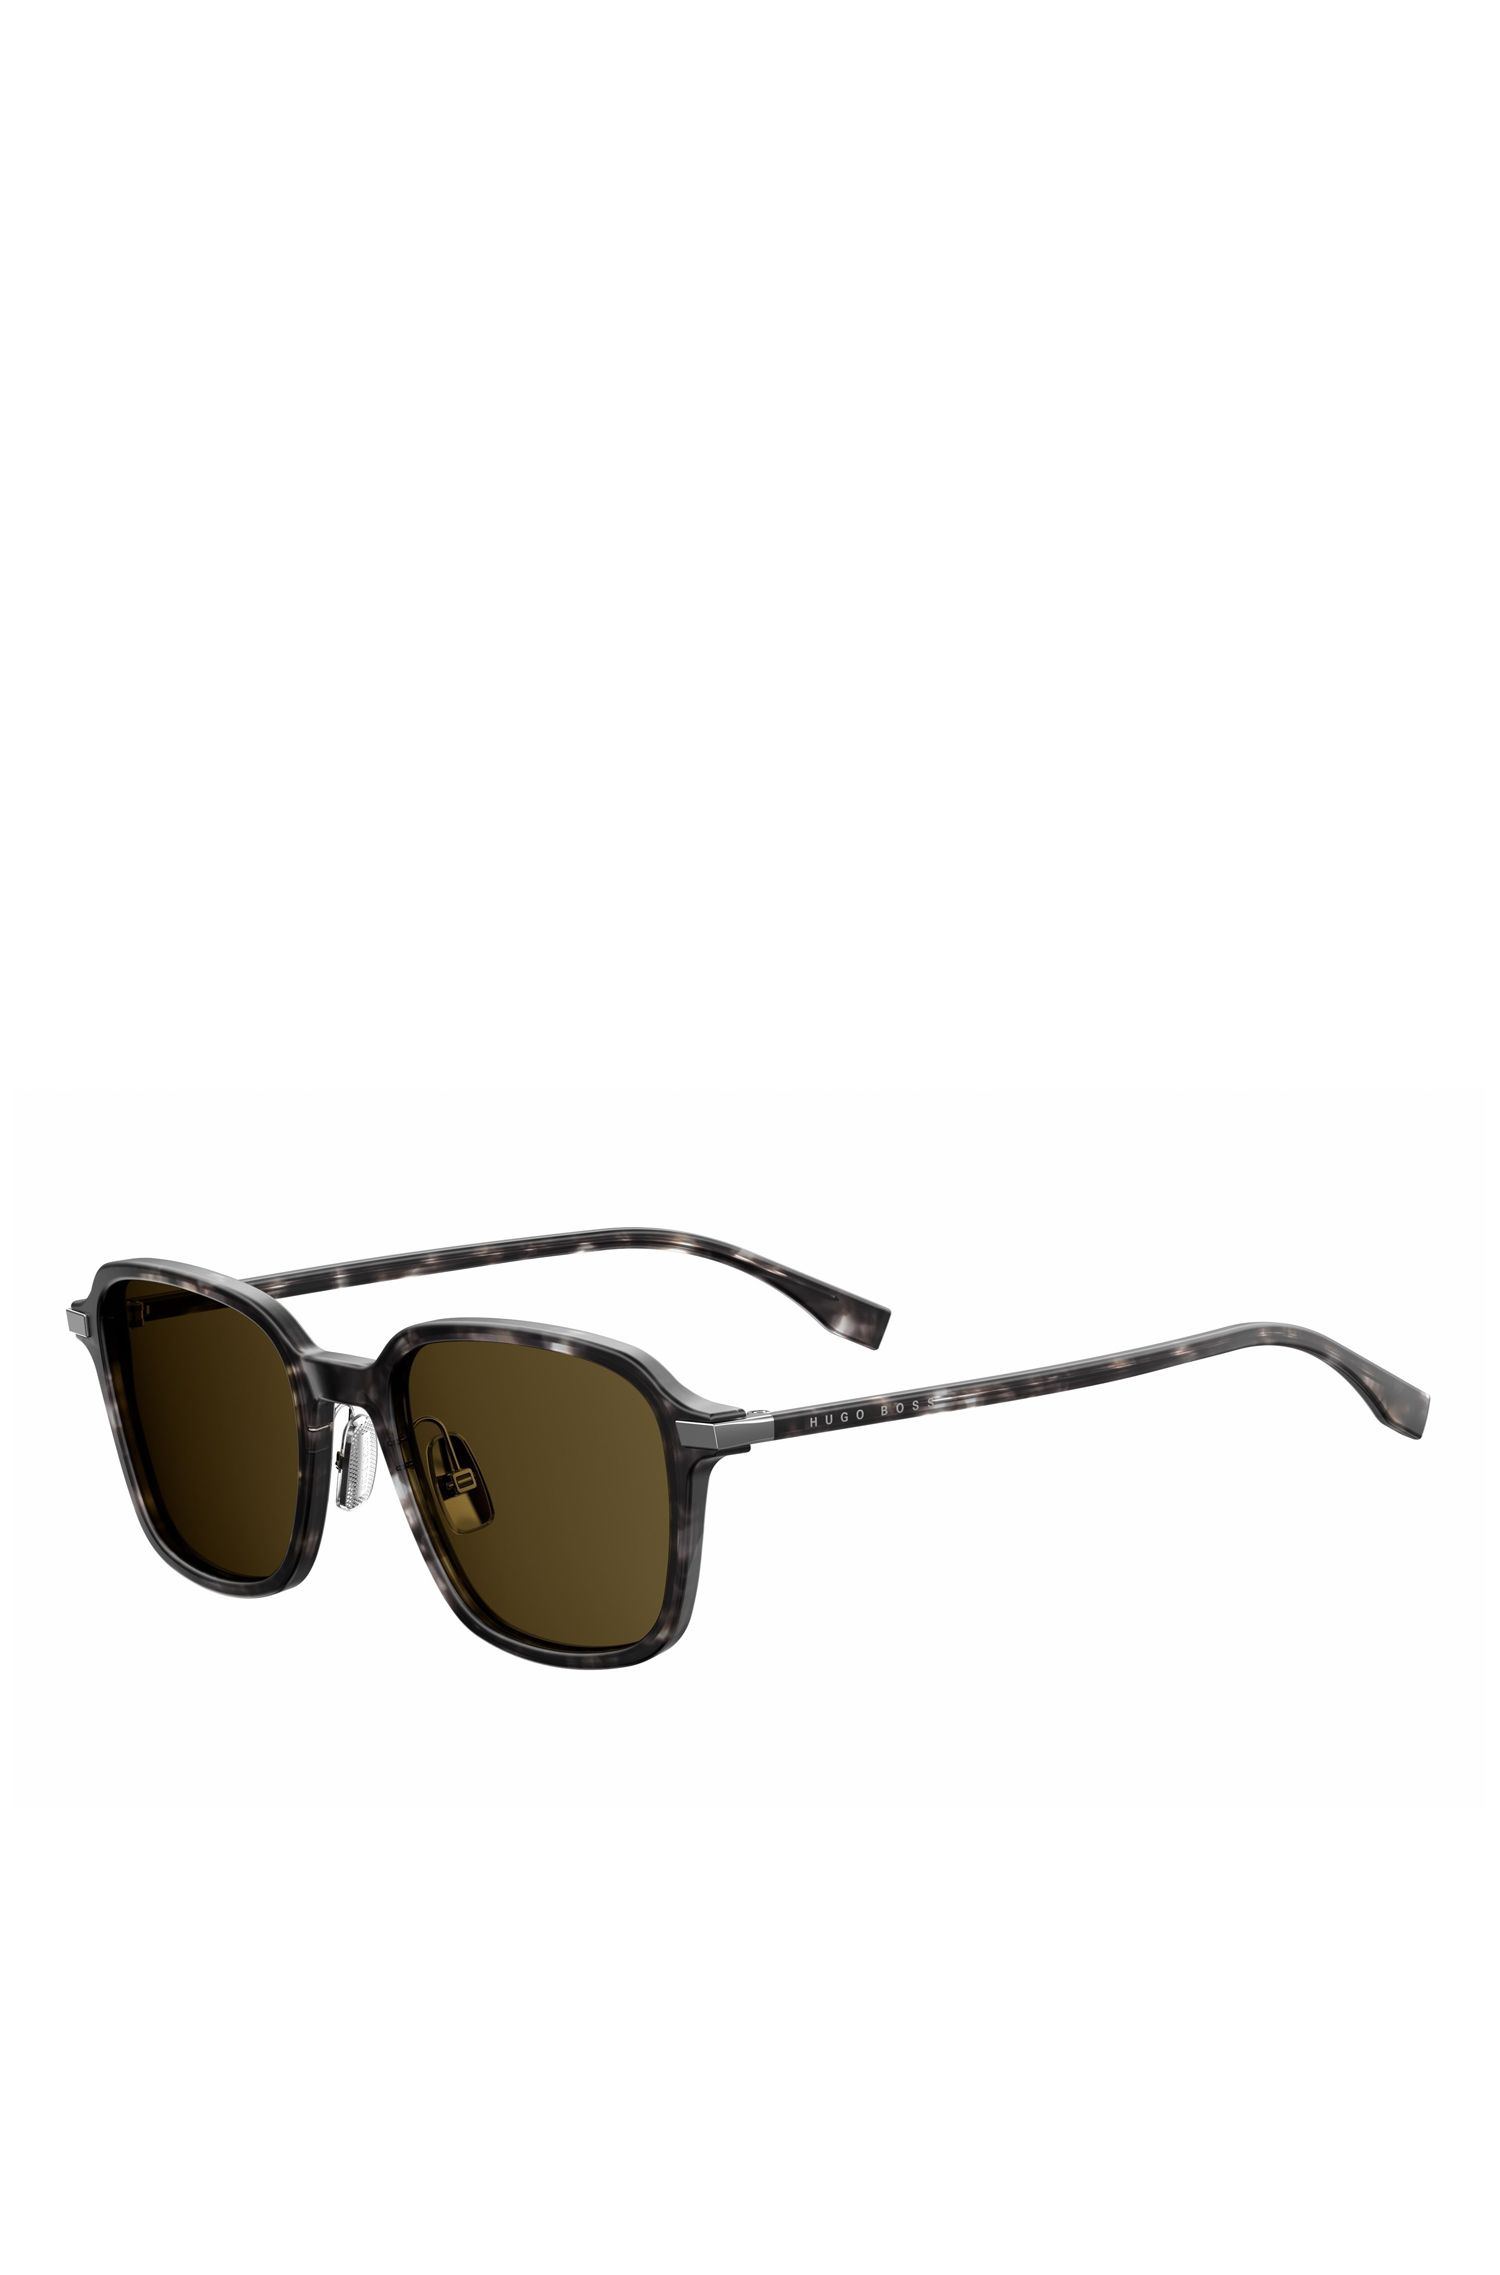 '0909S' | Brown Lens Havana Square Sunglasses